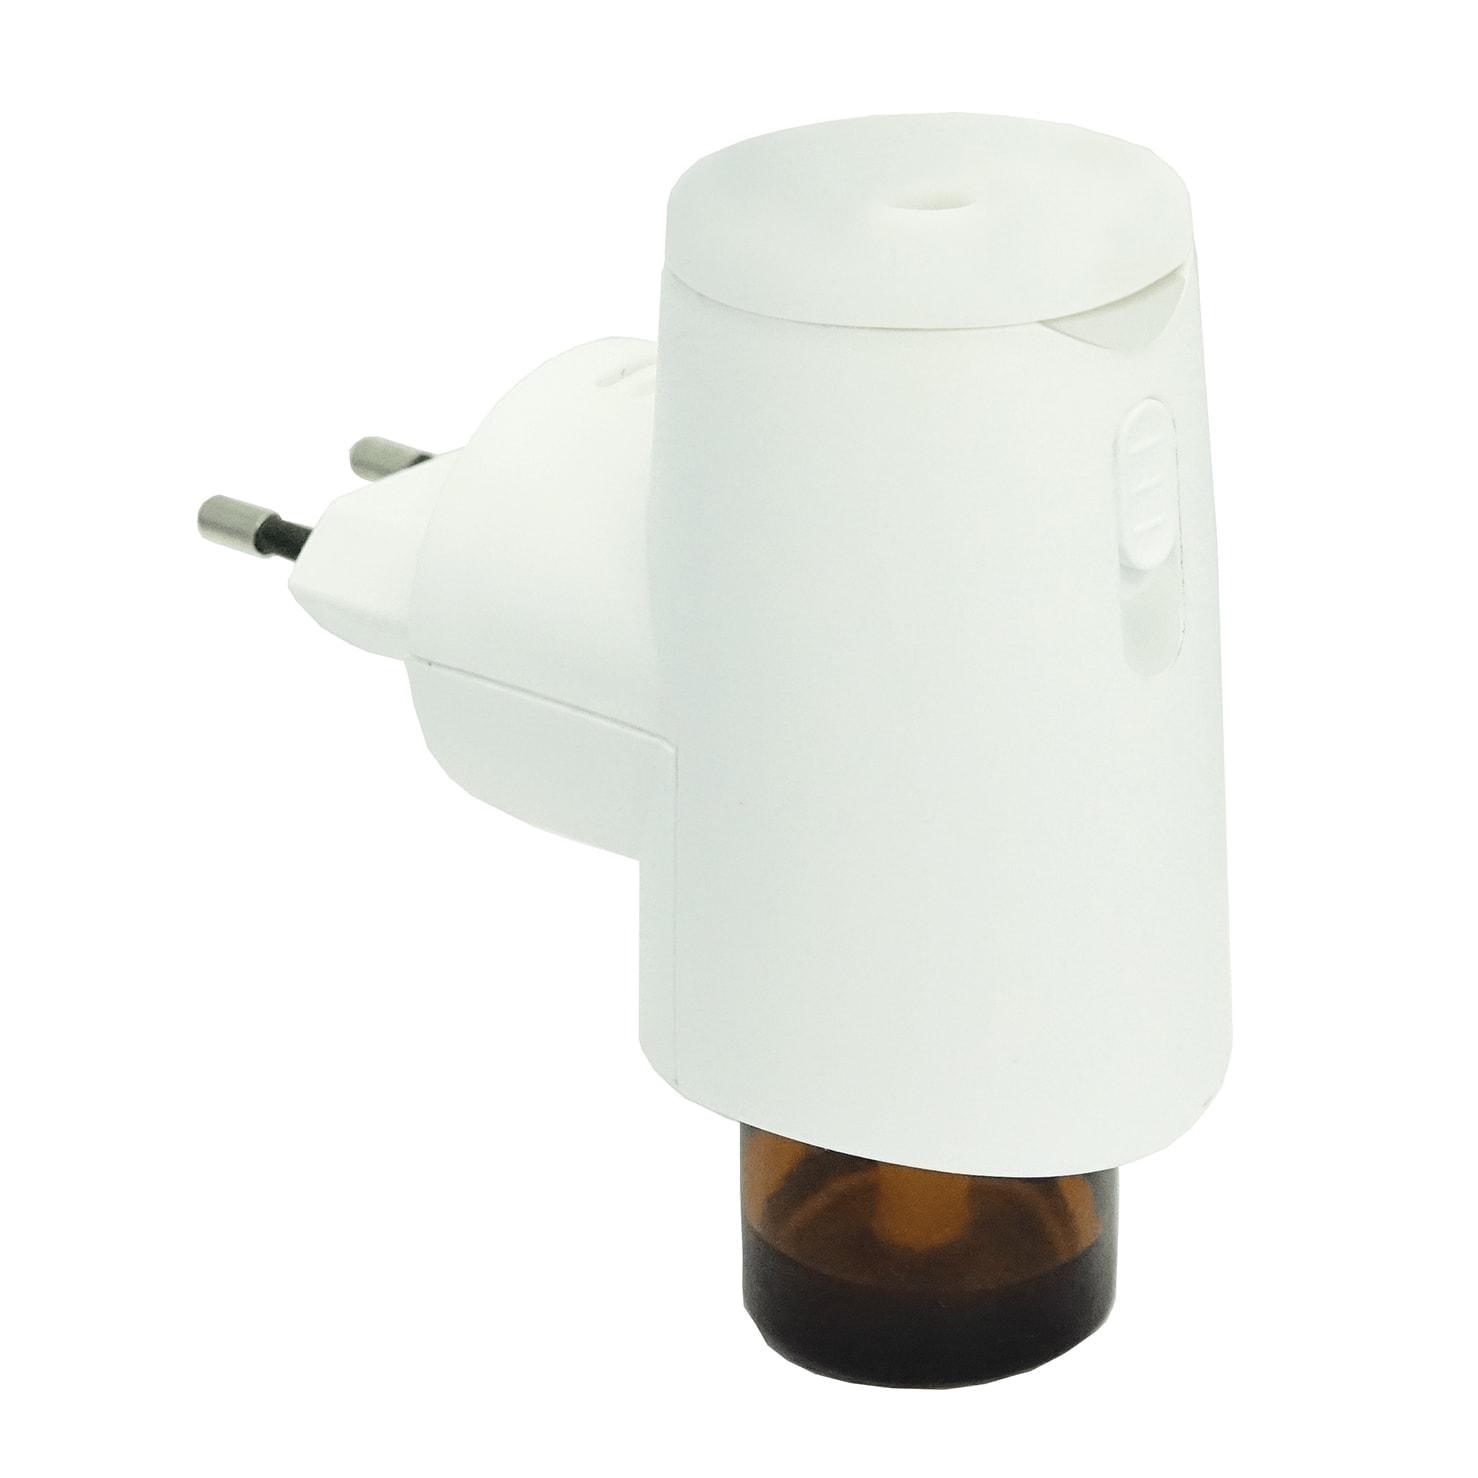 Florame Ultrasound Plug-in Diffuser